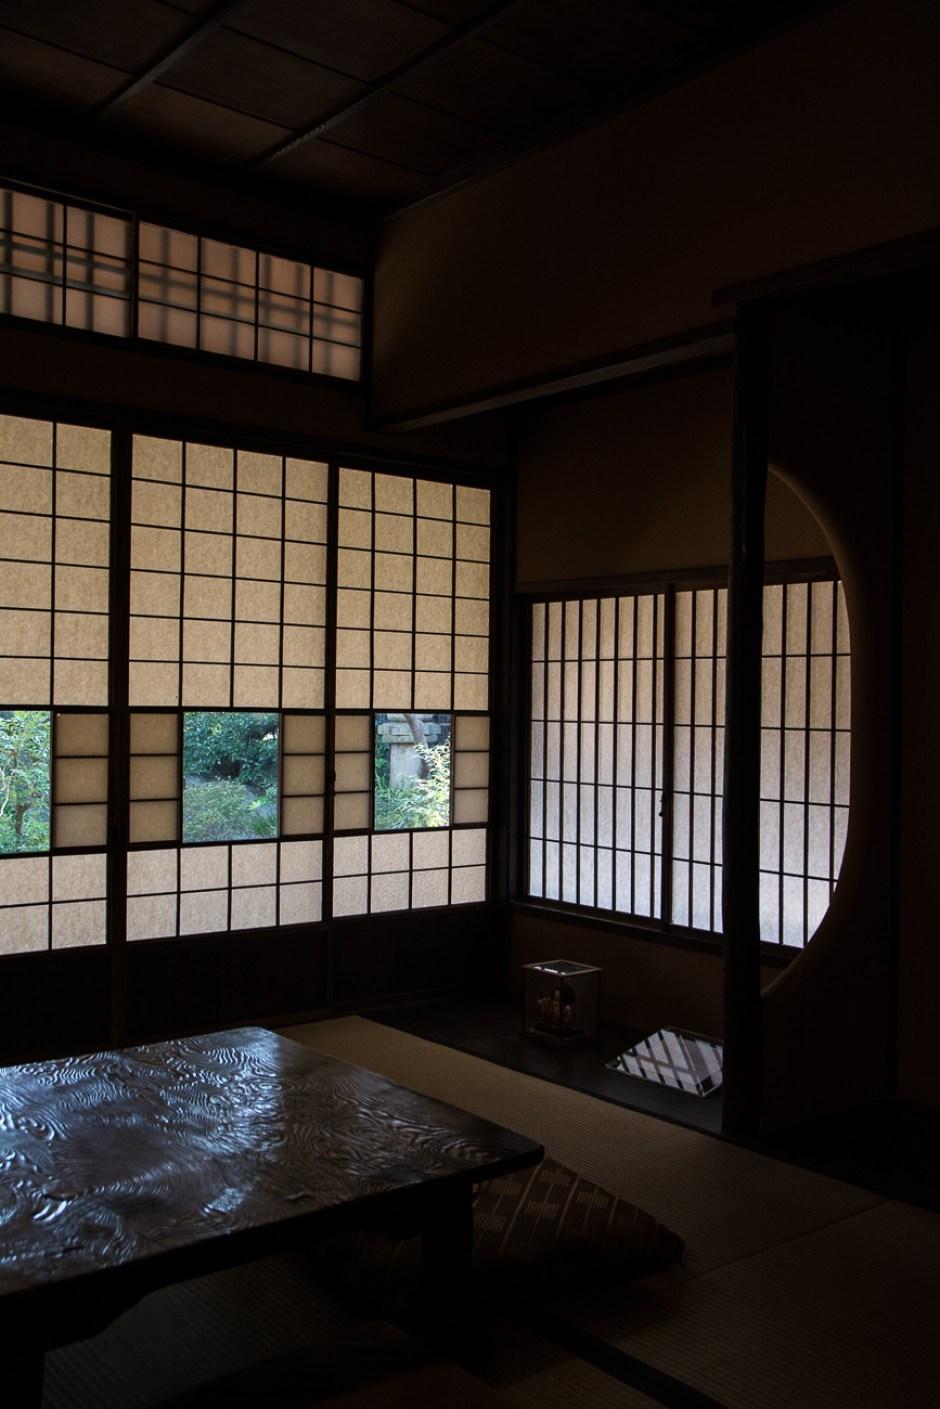 kusuo yasuda residence dans le quartier de Yanaka à Tokyo